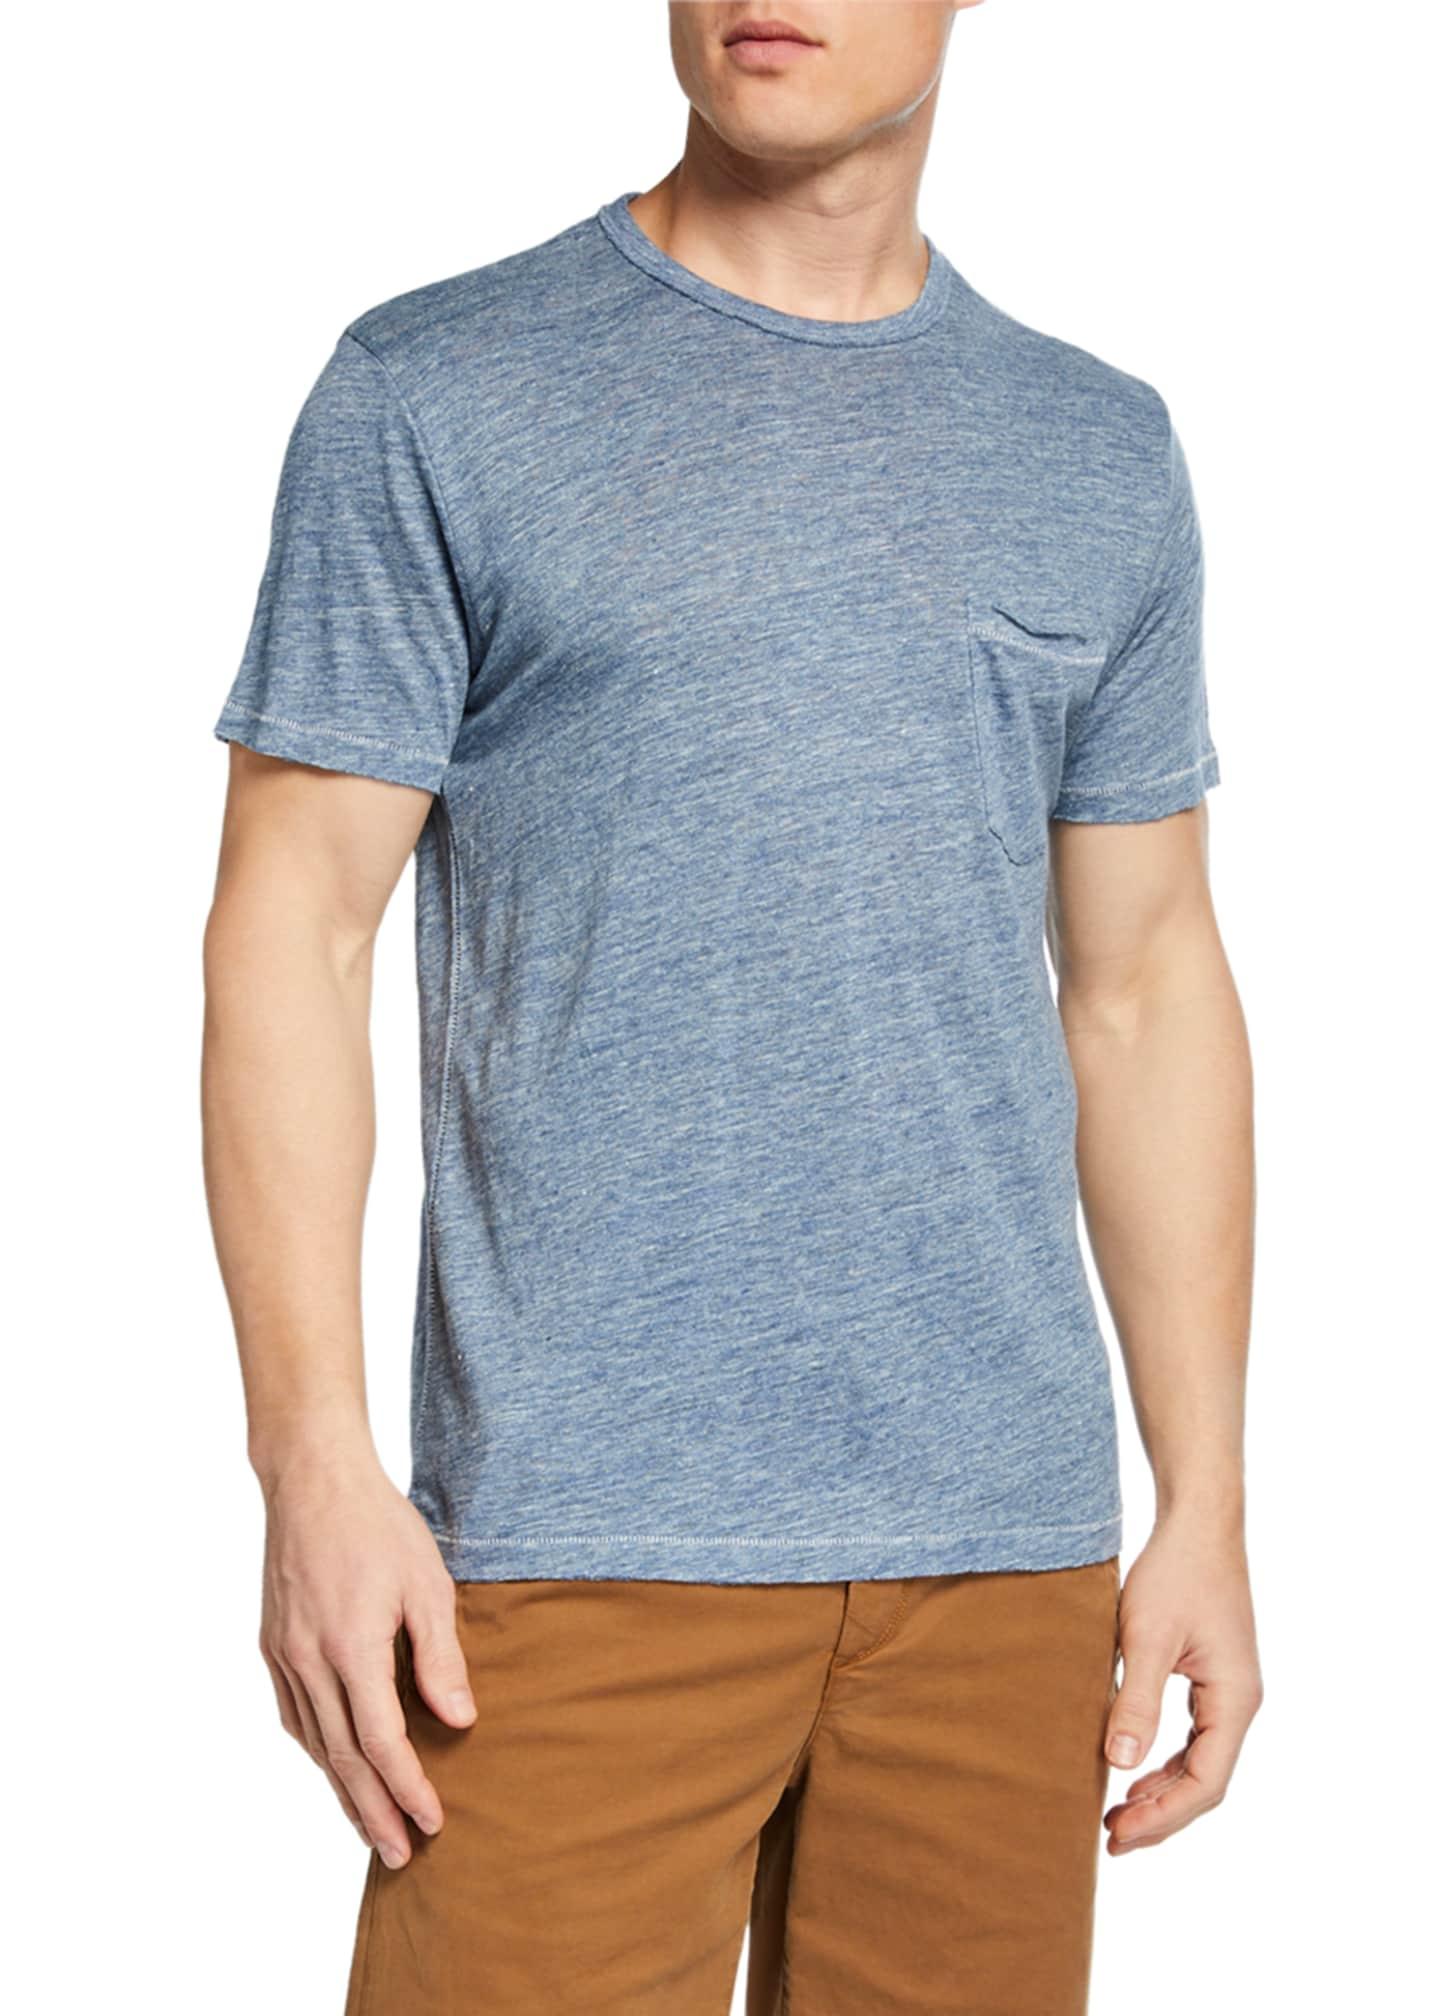 Rag & Bone Men's Owen Linen Pocket T-Shirt